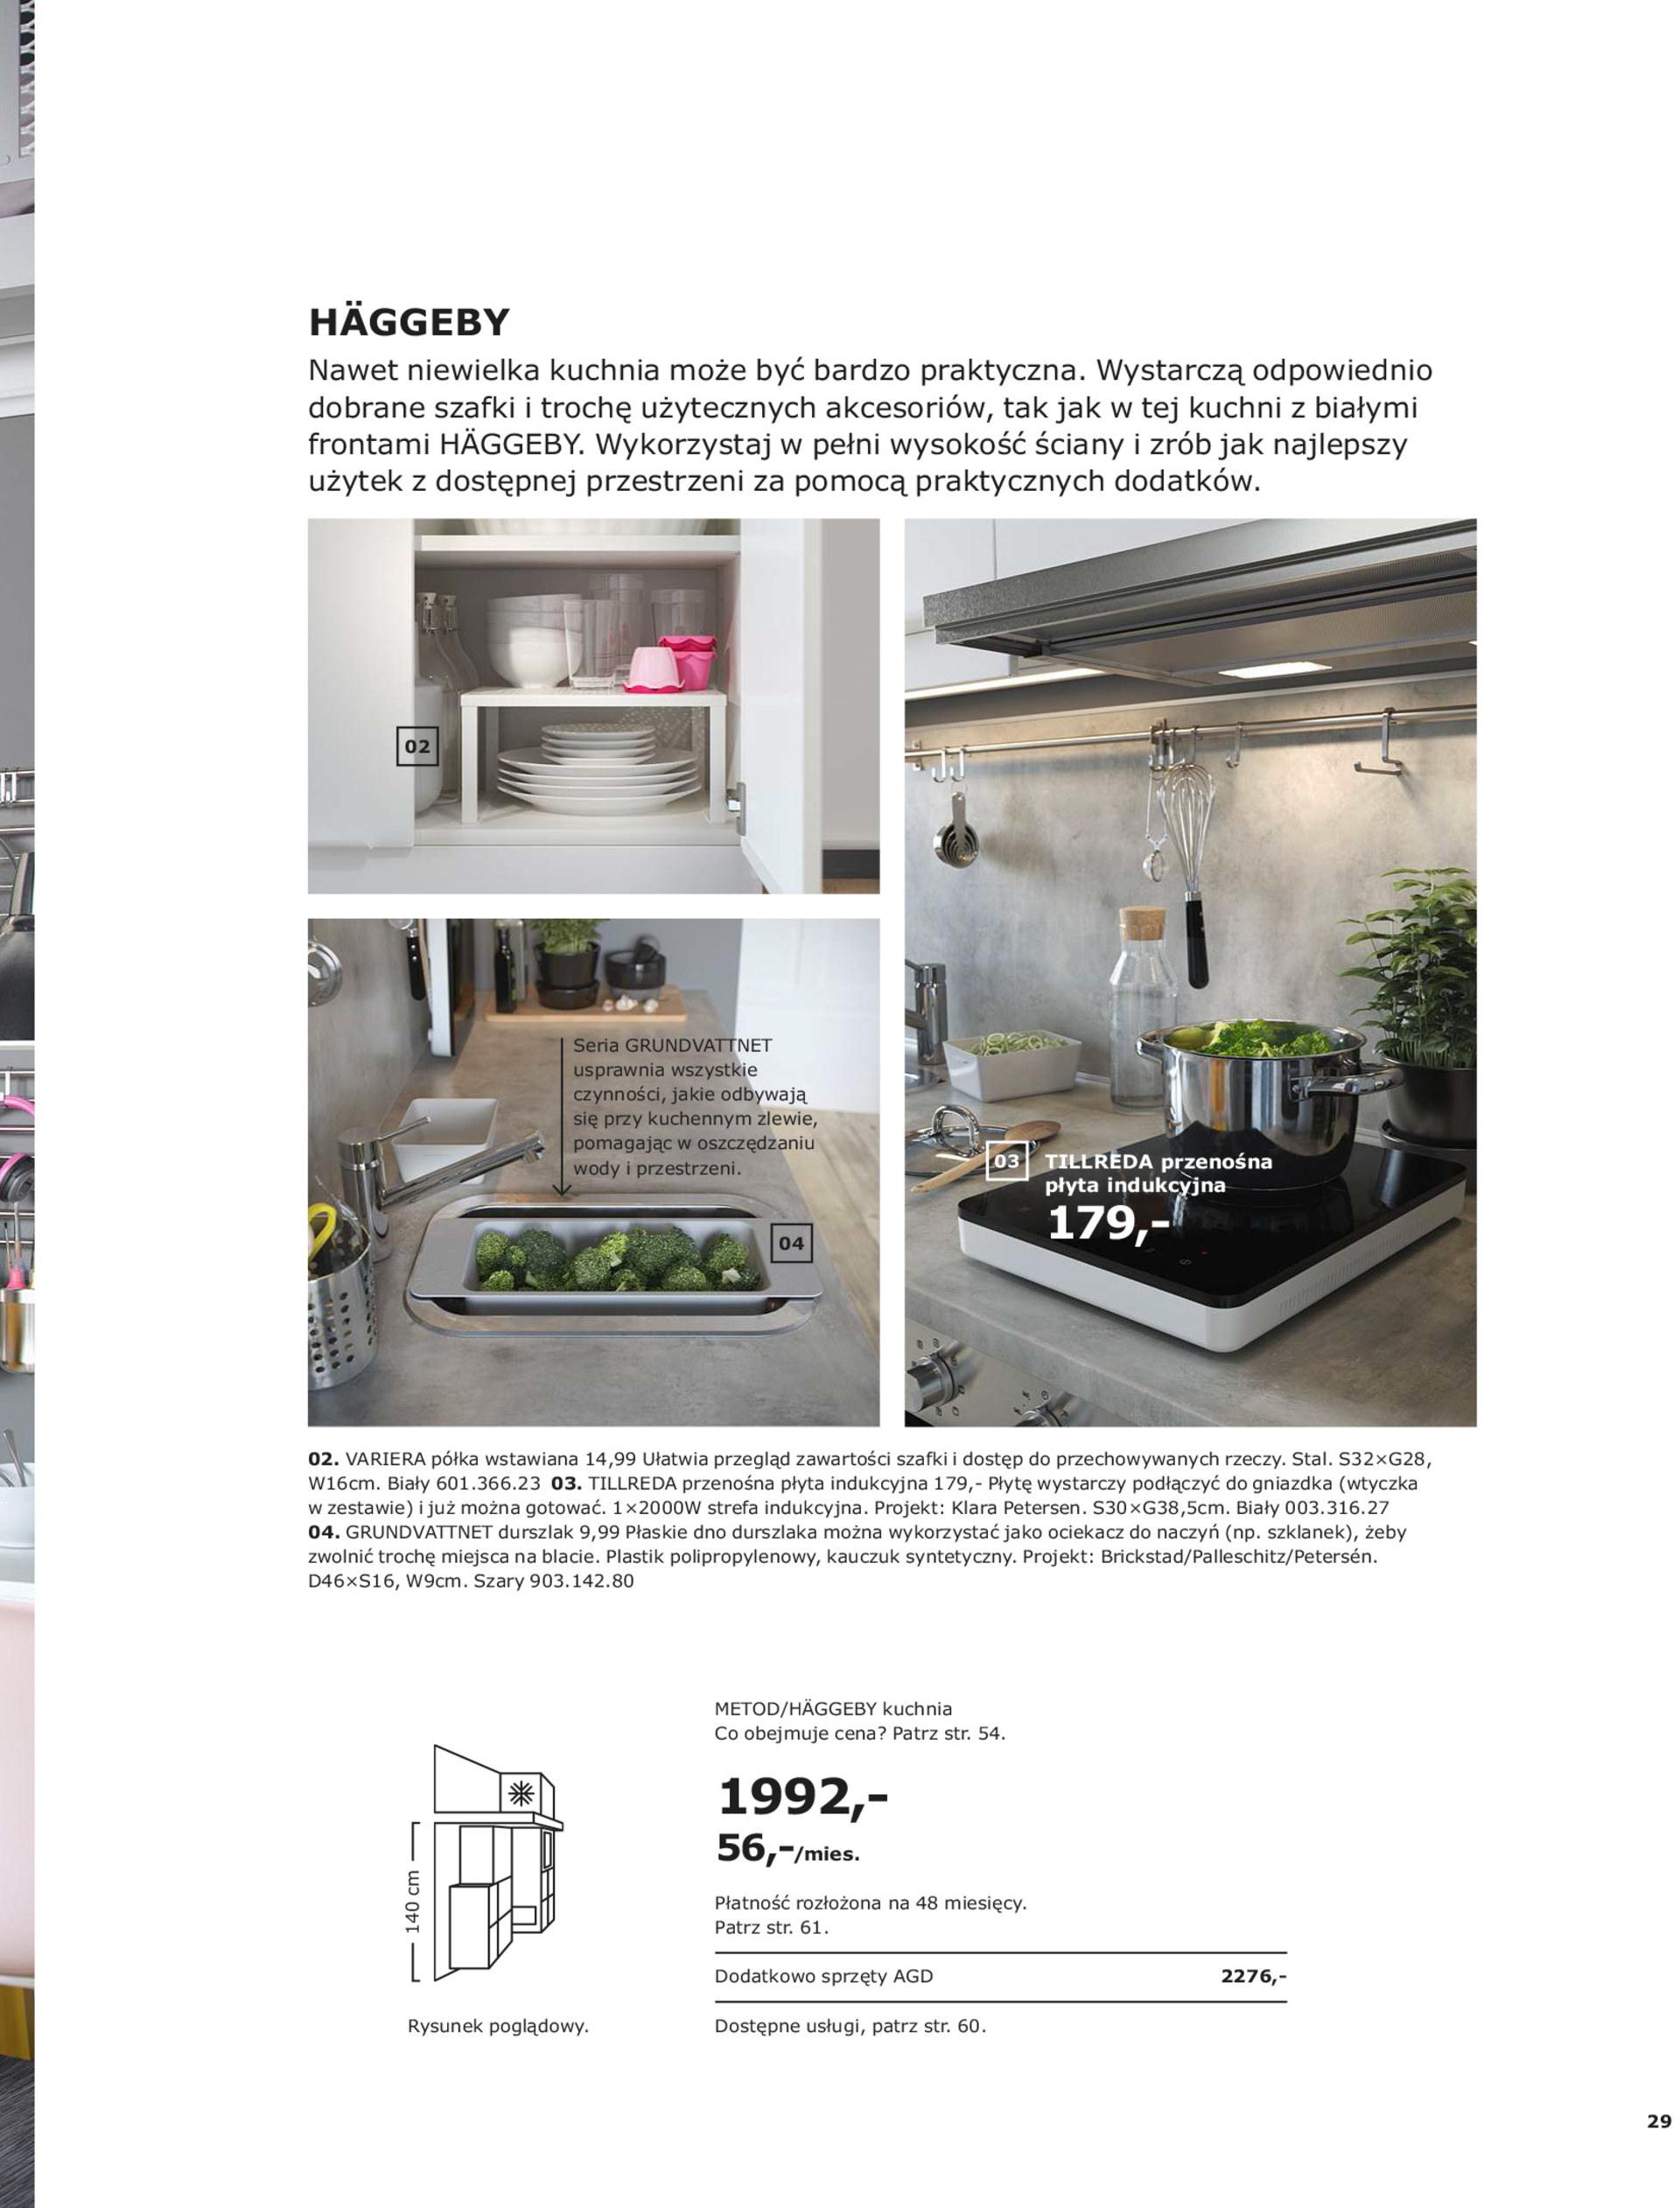 Gazetka Promocyjna Ikea Okazjum Pl S 15 35187